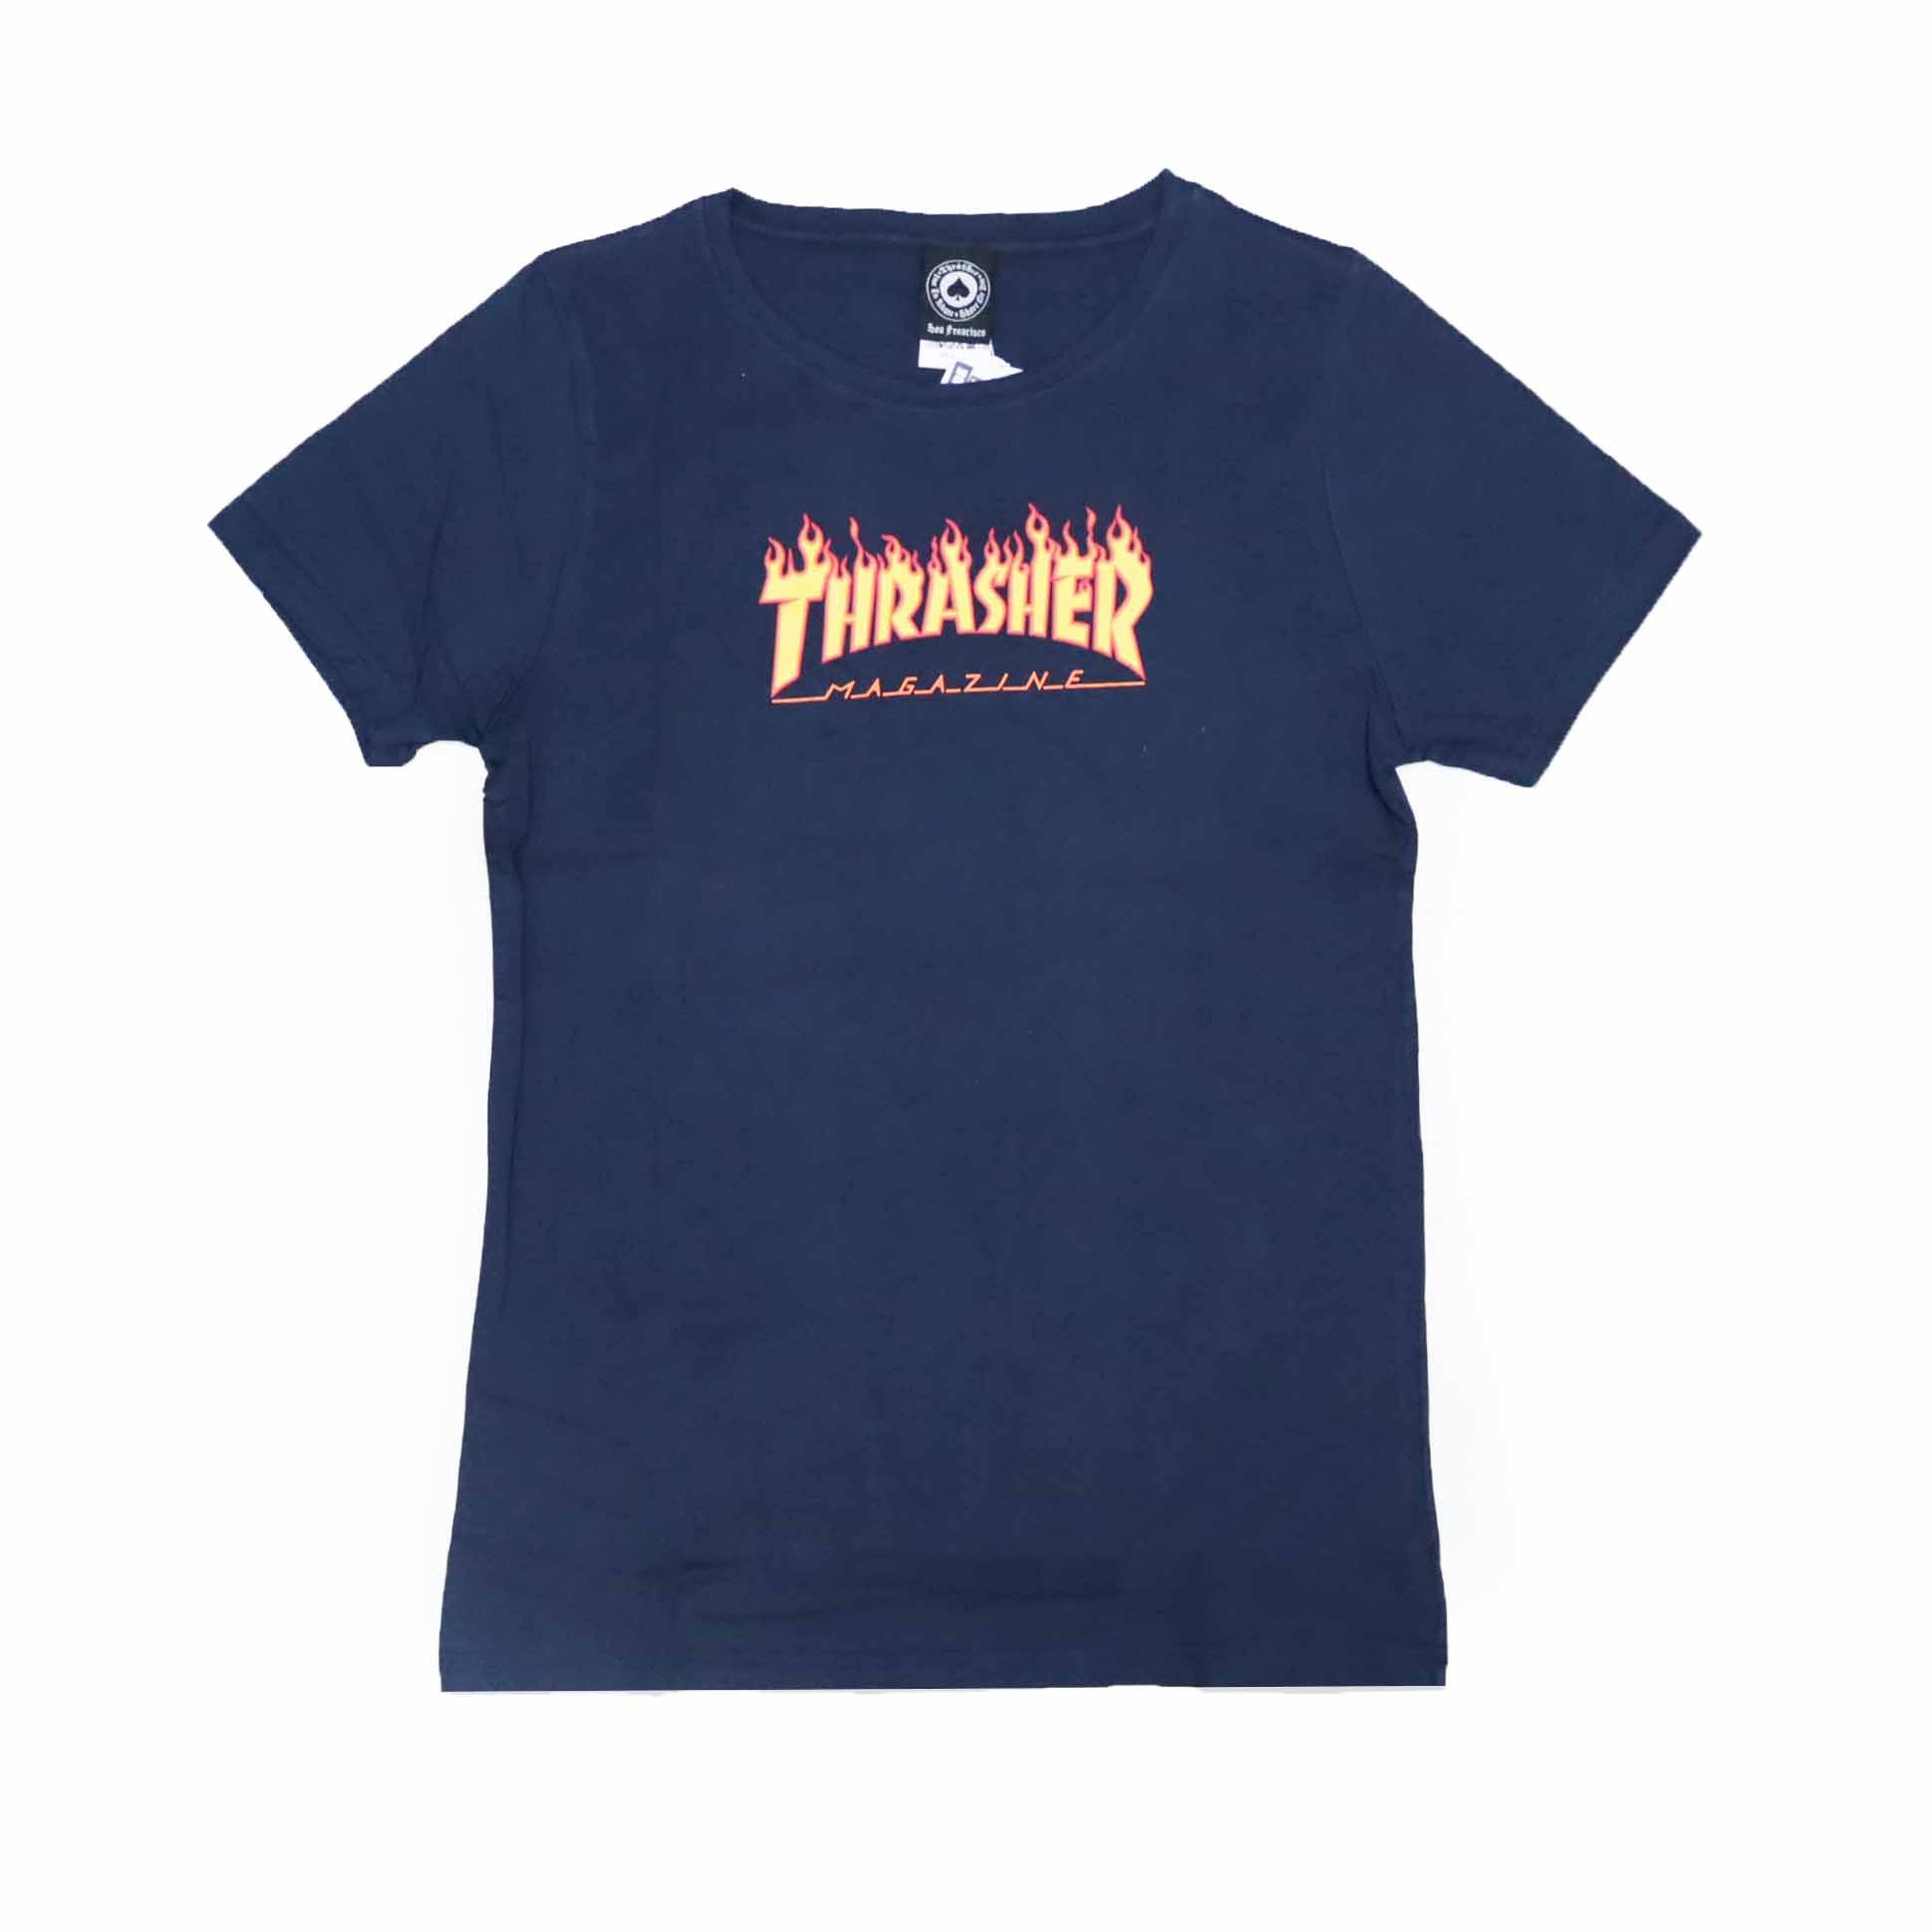 Camiseta Feminina Thrasher Magazine Classic Flame - Azul Marinho